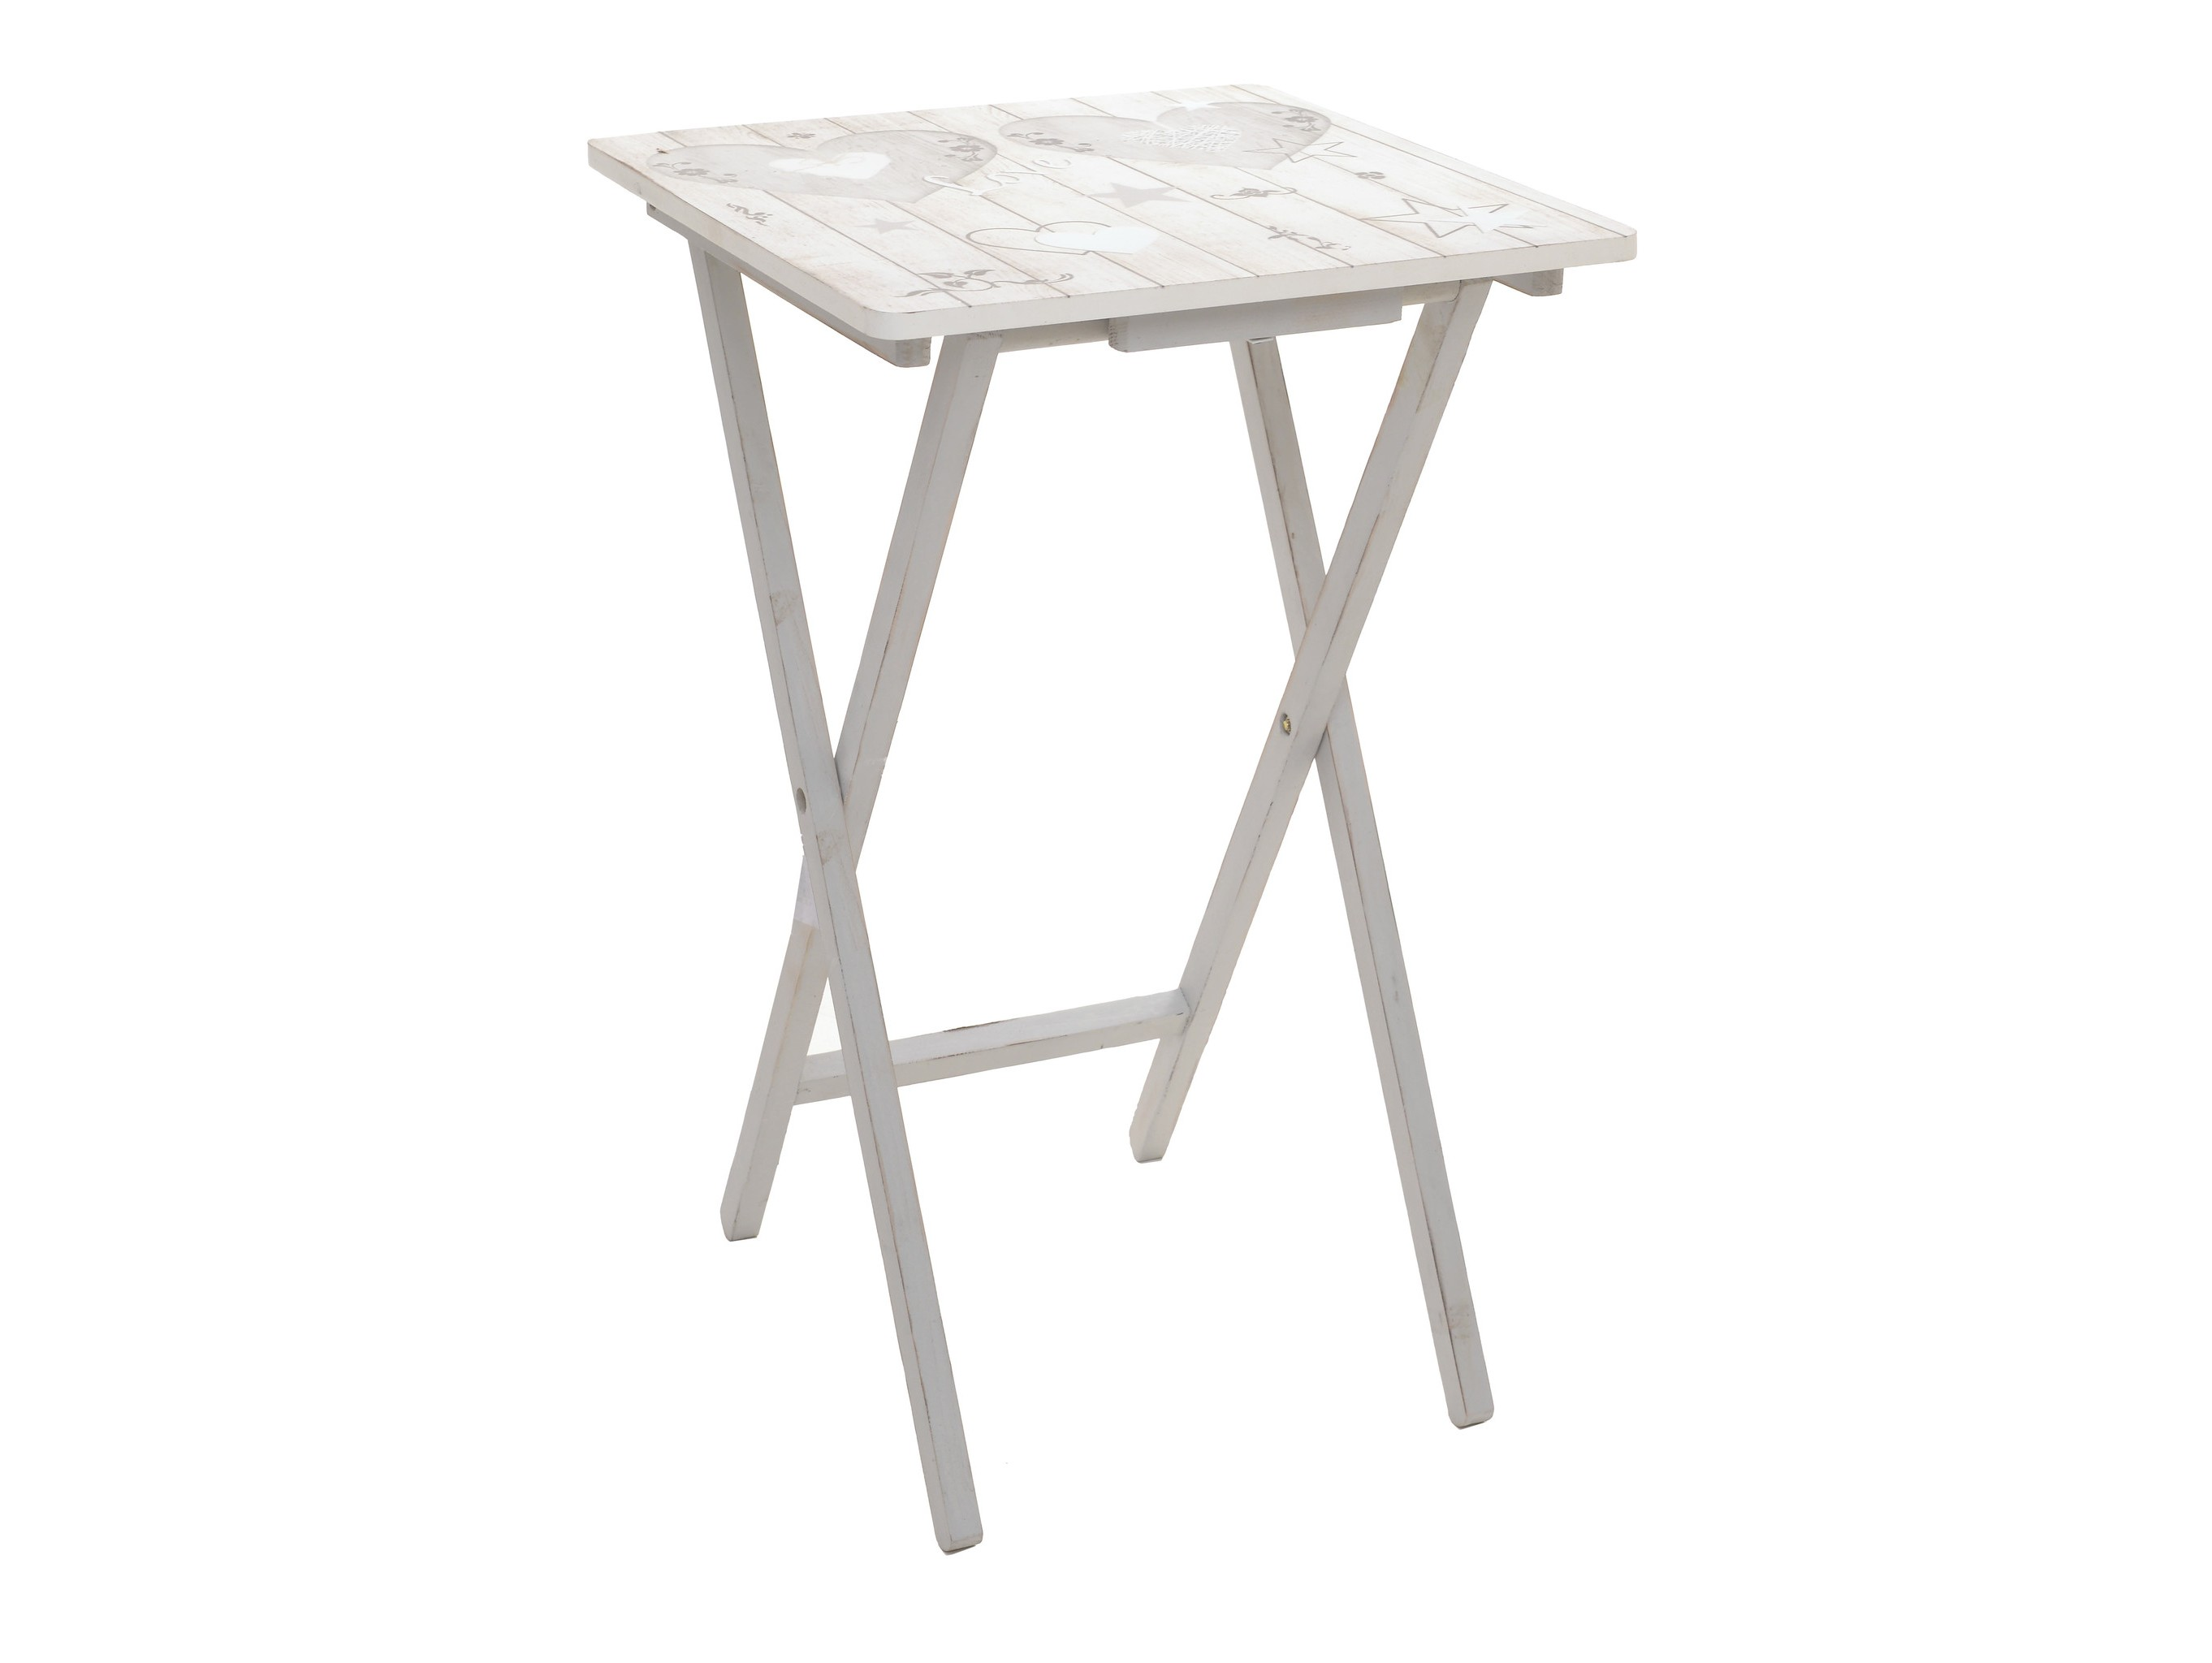 Стол-поднос MariameСервировочные столики<br><br><br>Material: Дуб<br>Ширина см: 40.0<br>Высота см: 64.0<br>Глубина см: 40.0